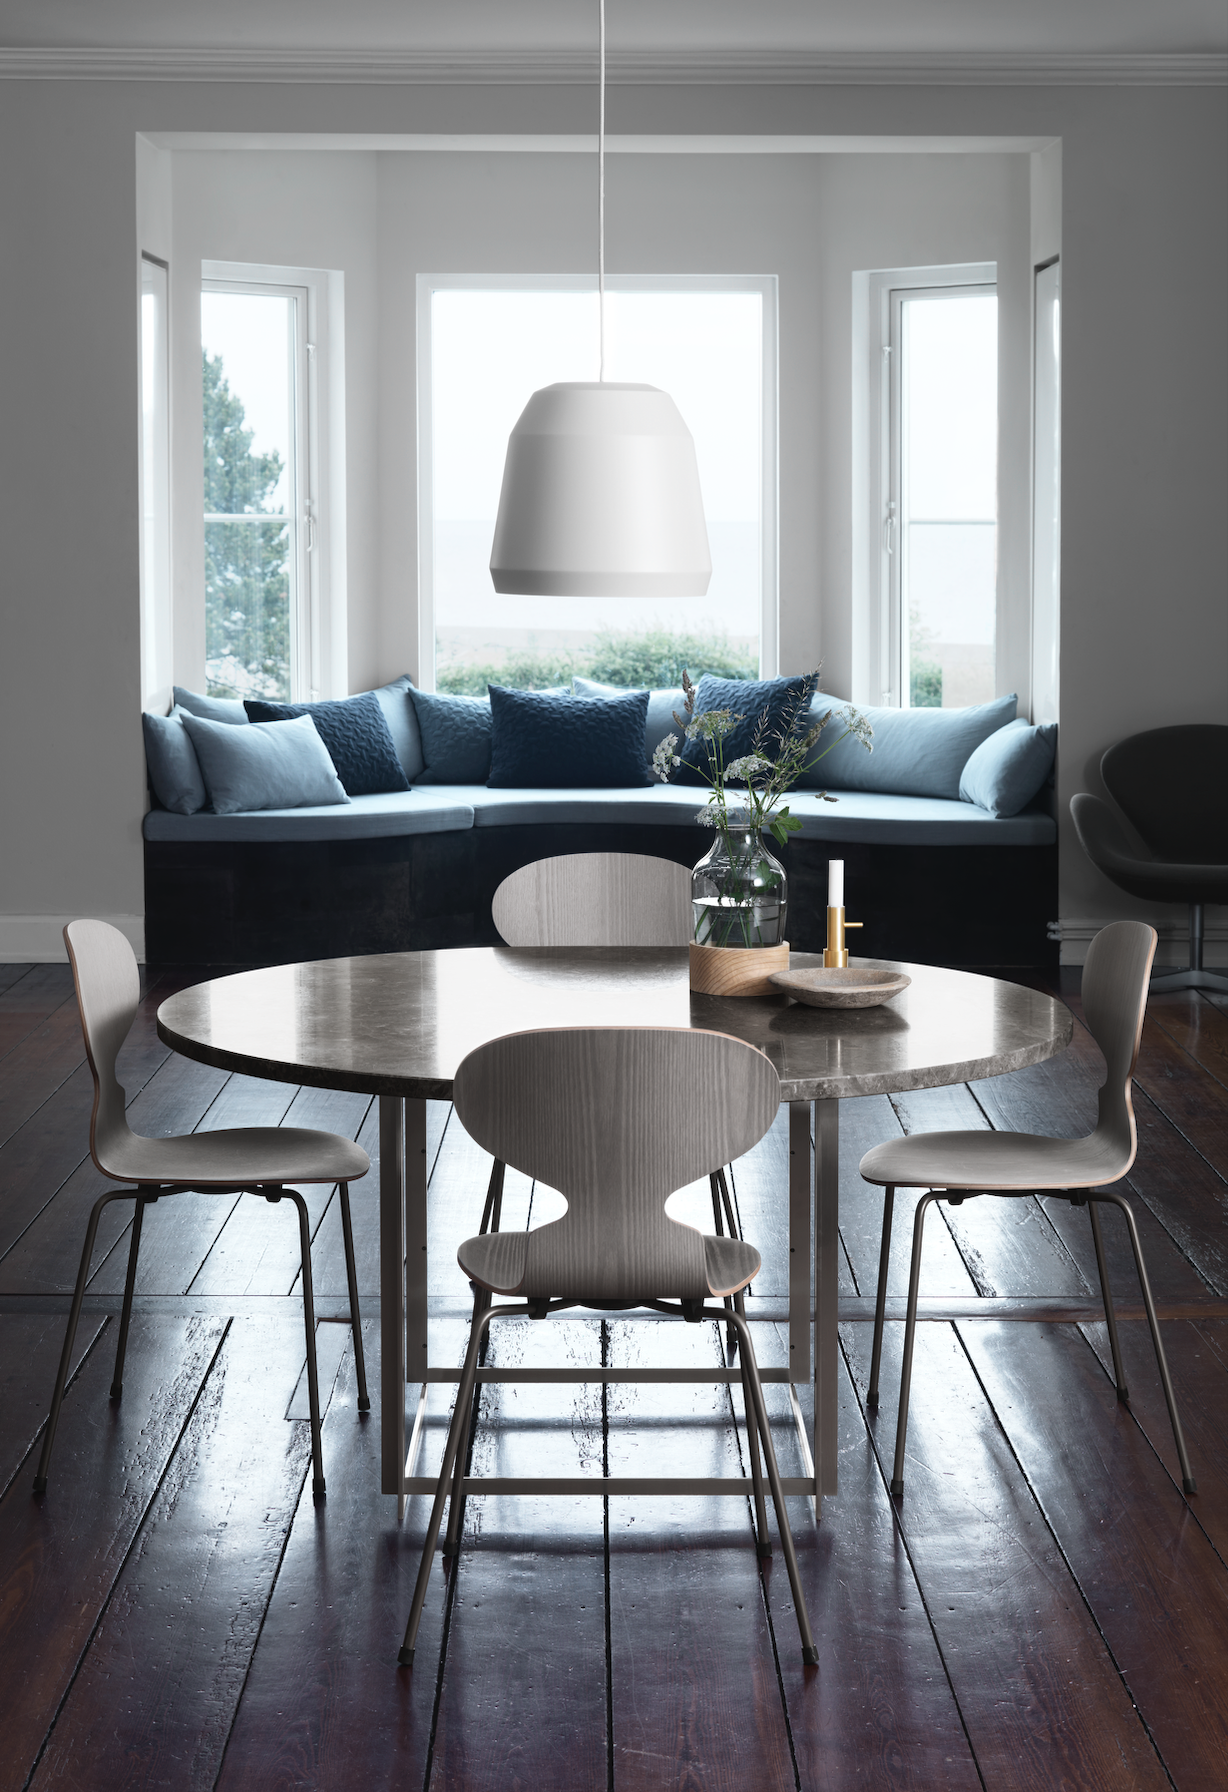 Fritz Hansen Design Stoelen.Mier Stoel Van Fritz Hansen Loncin Interieur A Beautiful Home